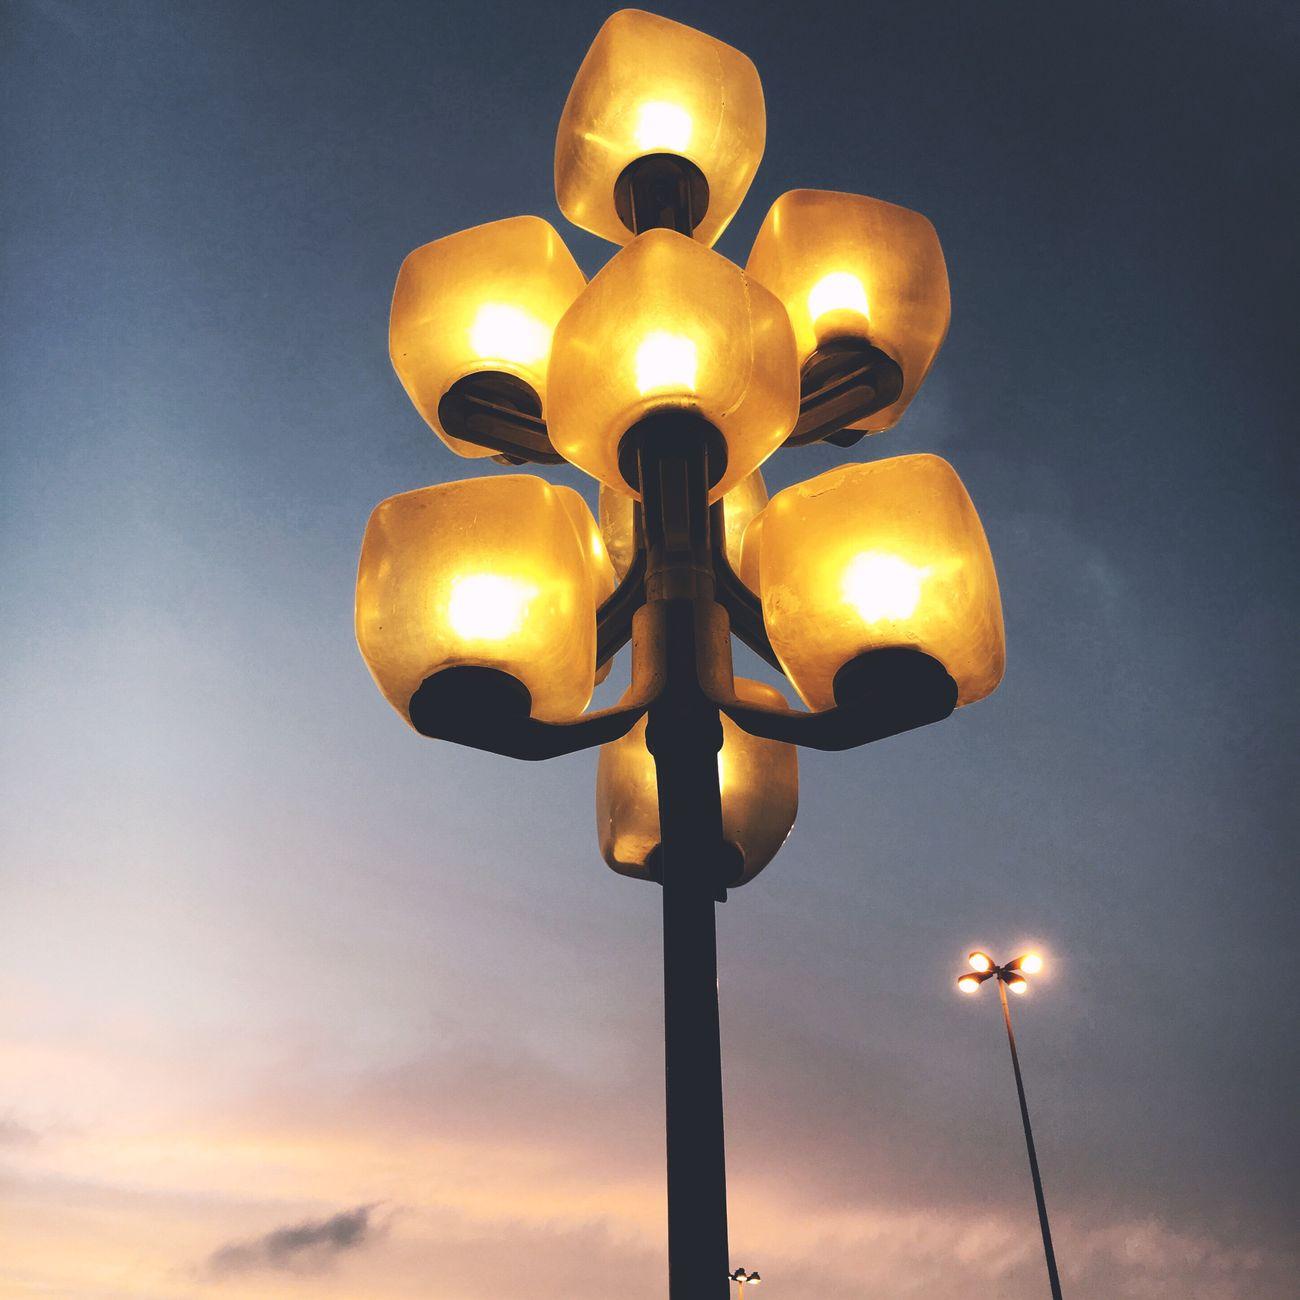 Light Lightpost Jeddah Saudi Arabia Albalad Balad EyeEm IPhoneography Photo Of The Day Photography Photooftheday Eyemphotography EyeEm Gallery